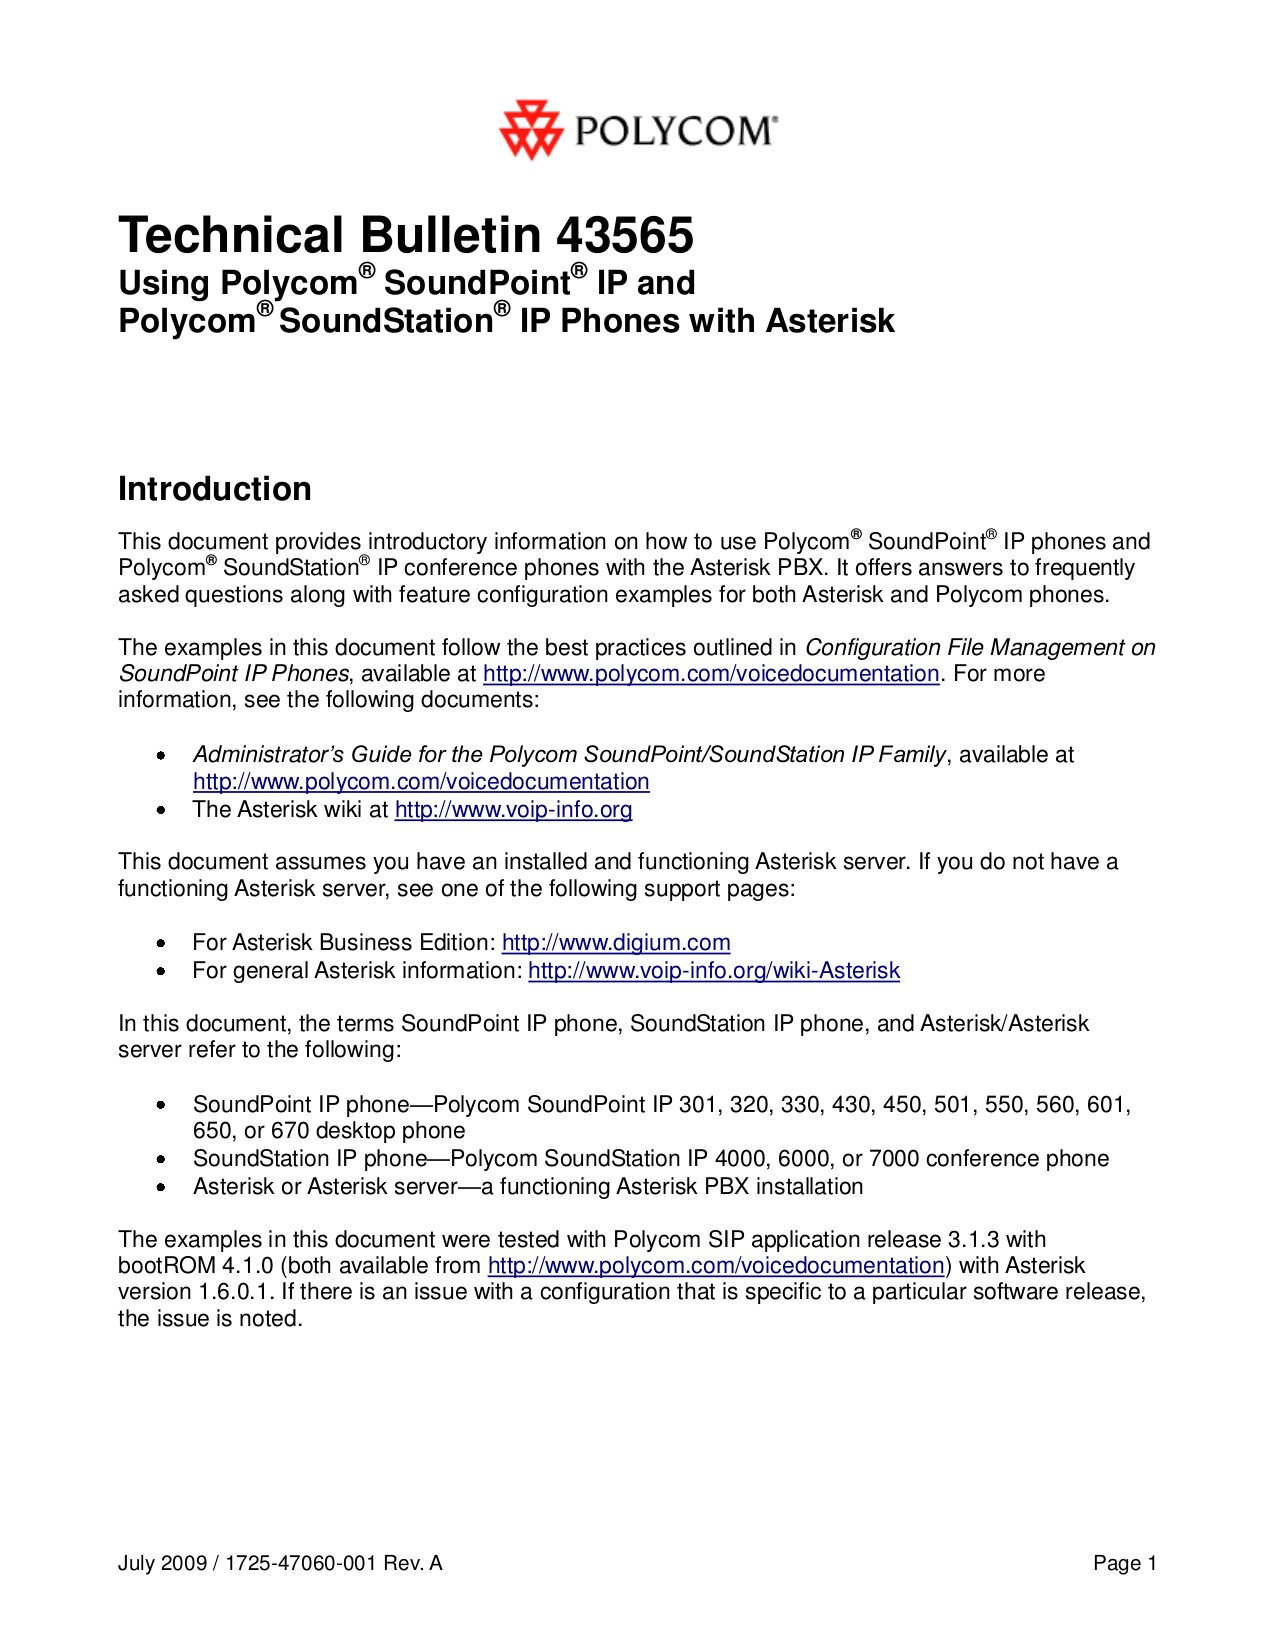 Download free pdf for SpectraLink Link 3000 PBX manual